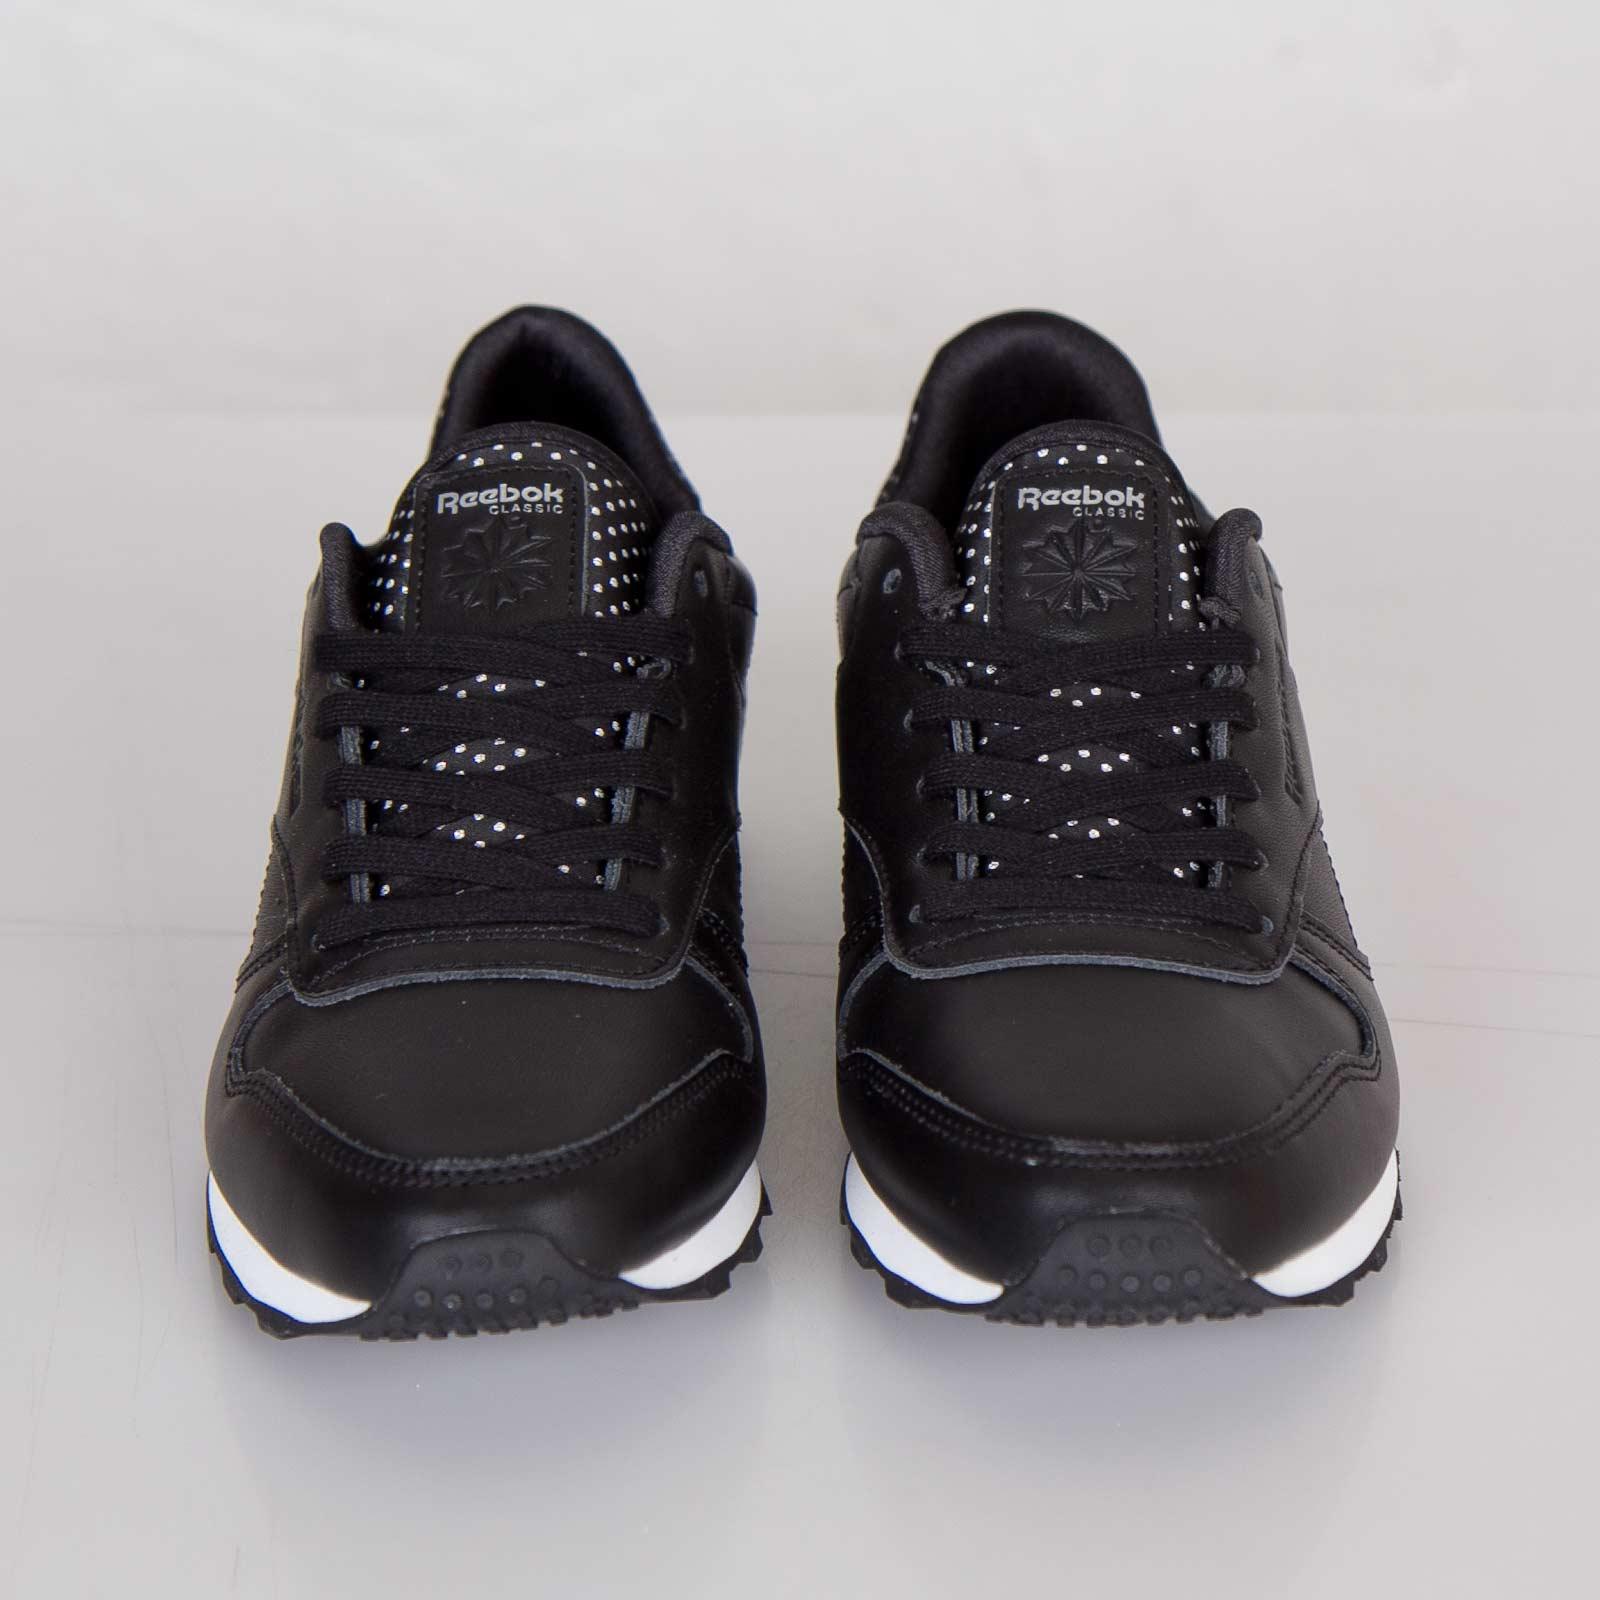 Reebok Classic Leather Mini Dots V55174 Sneakersnstuff I